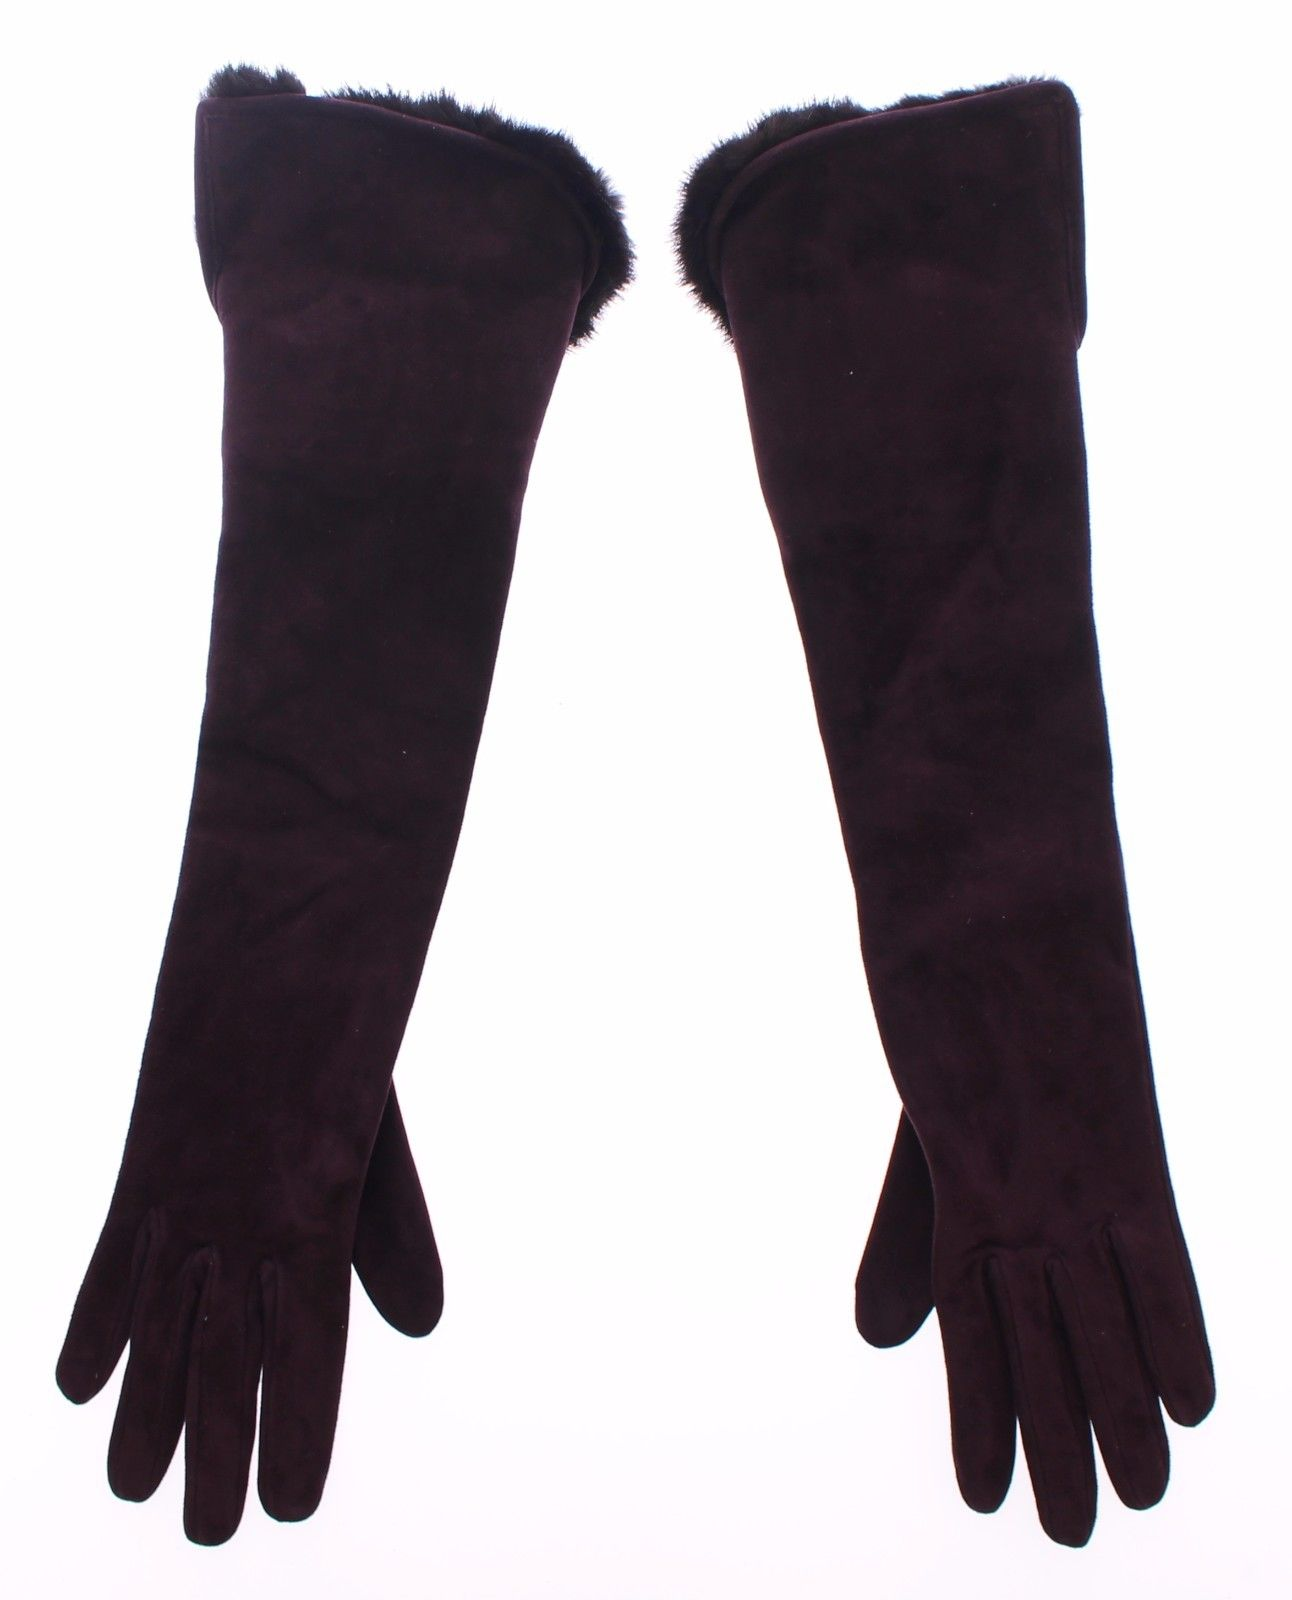 Dolce & Gabbana Women's Mink Fur Goatskin Suede Leather Gloves Purple MOM11456 - 7.5   M